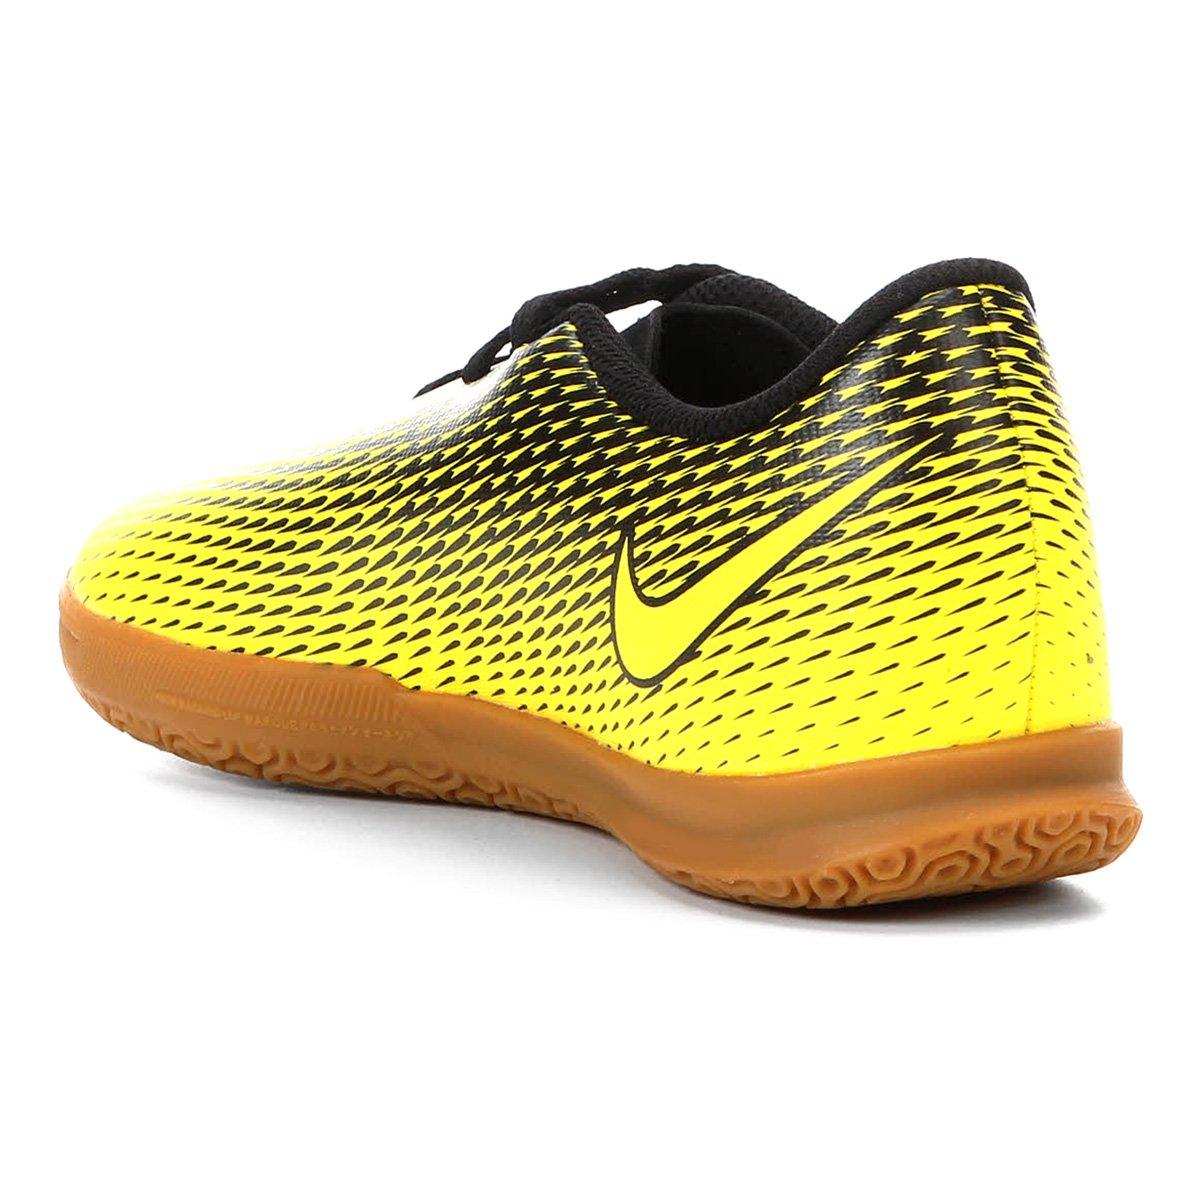 Chuteira Futsal Infantil Nike Bravata II IC - Amarelo e Preto ... 0596fce2a6e87